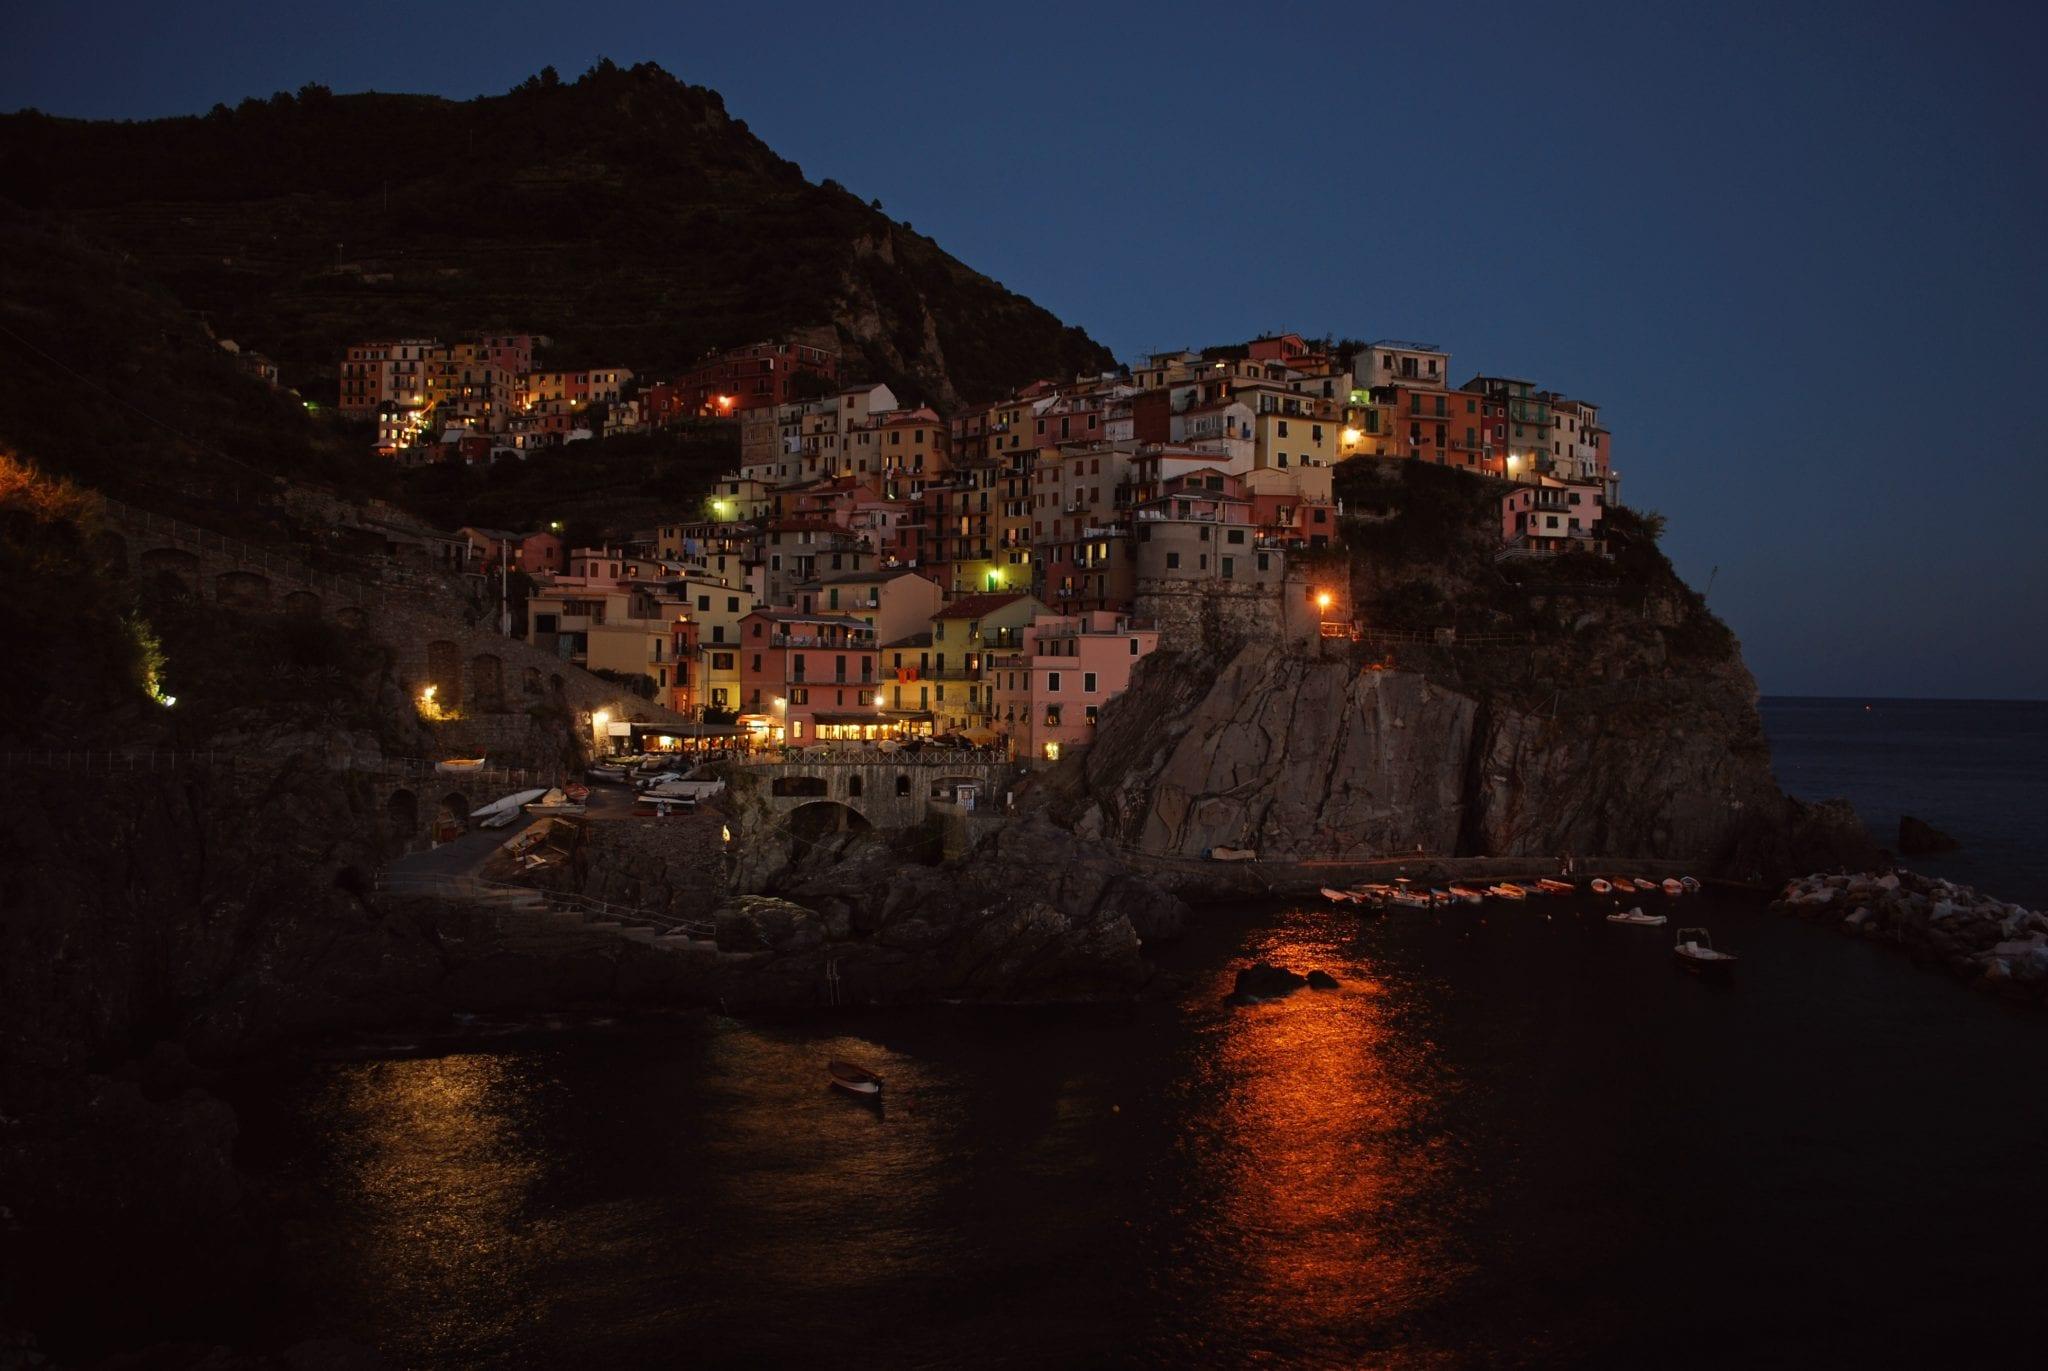 Slipperverbod in Cinque Terre